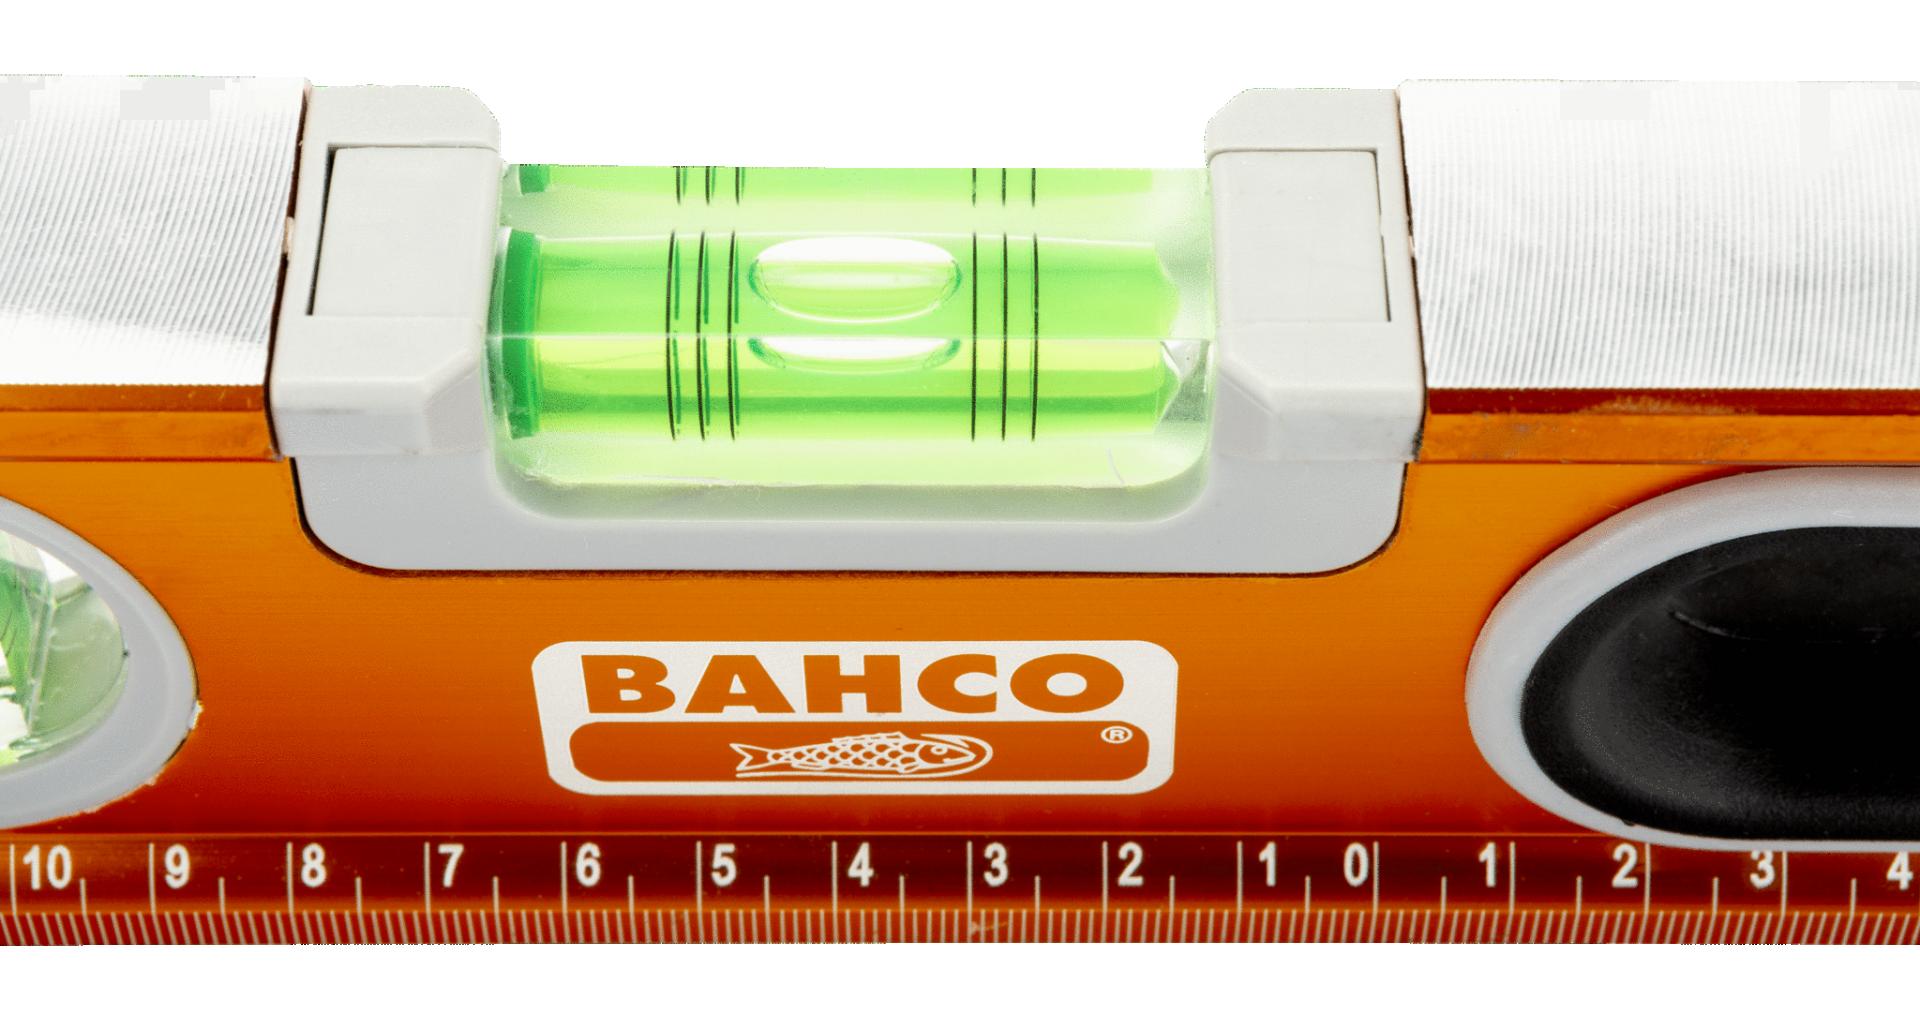 Poziomica 1200 mm aluminiowa, anodowana Bahco (nr kat. 466-1200)